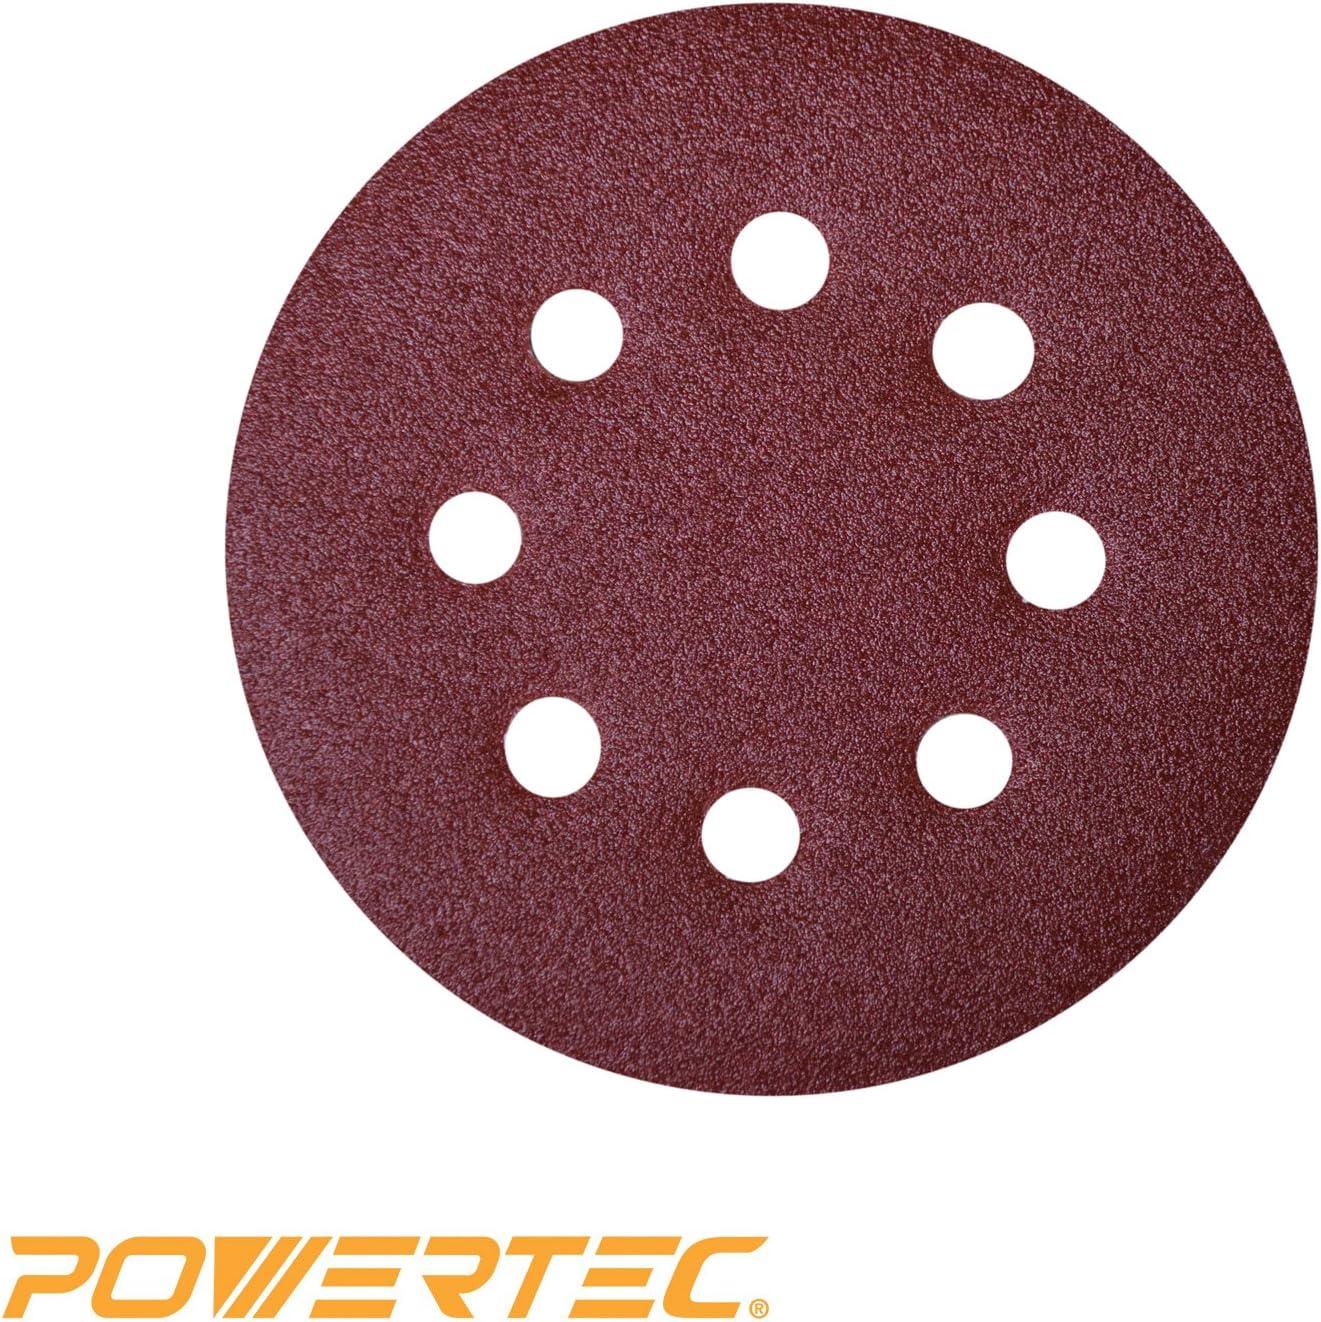 1000//800//600//400//320//240 Grit Sandpaper for 60Pcs Sanding Discs 5 Inch 8 Holes